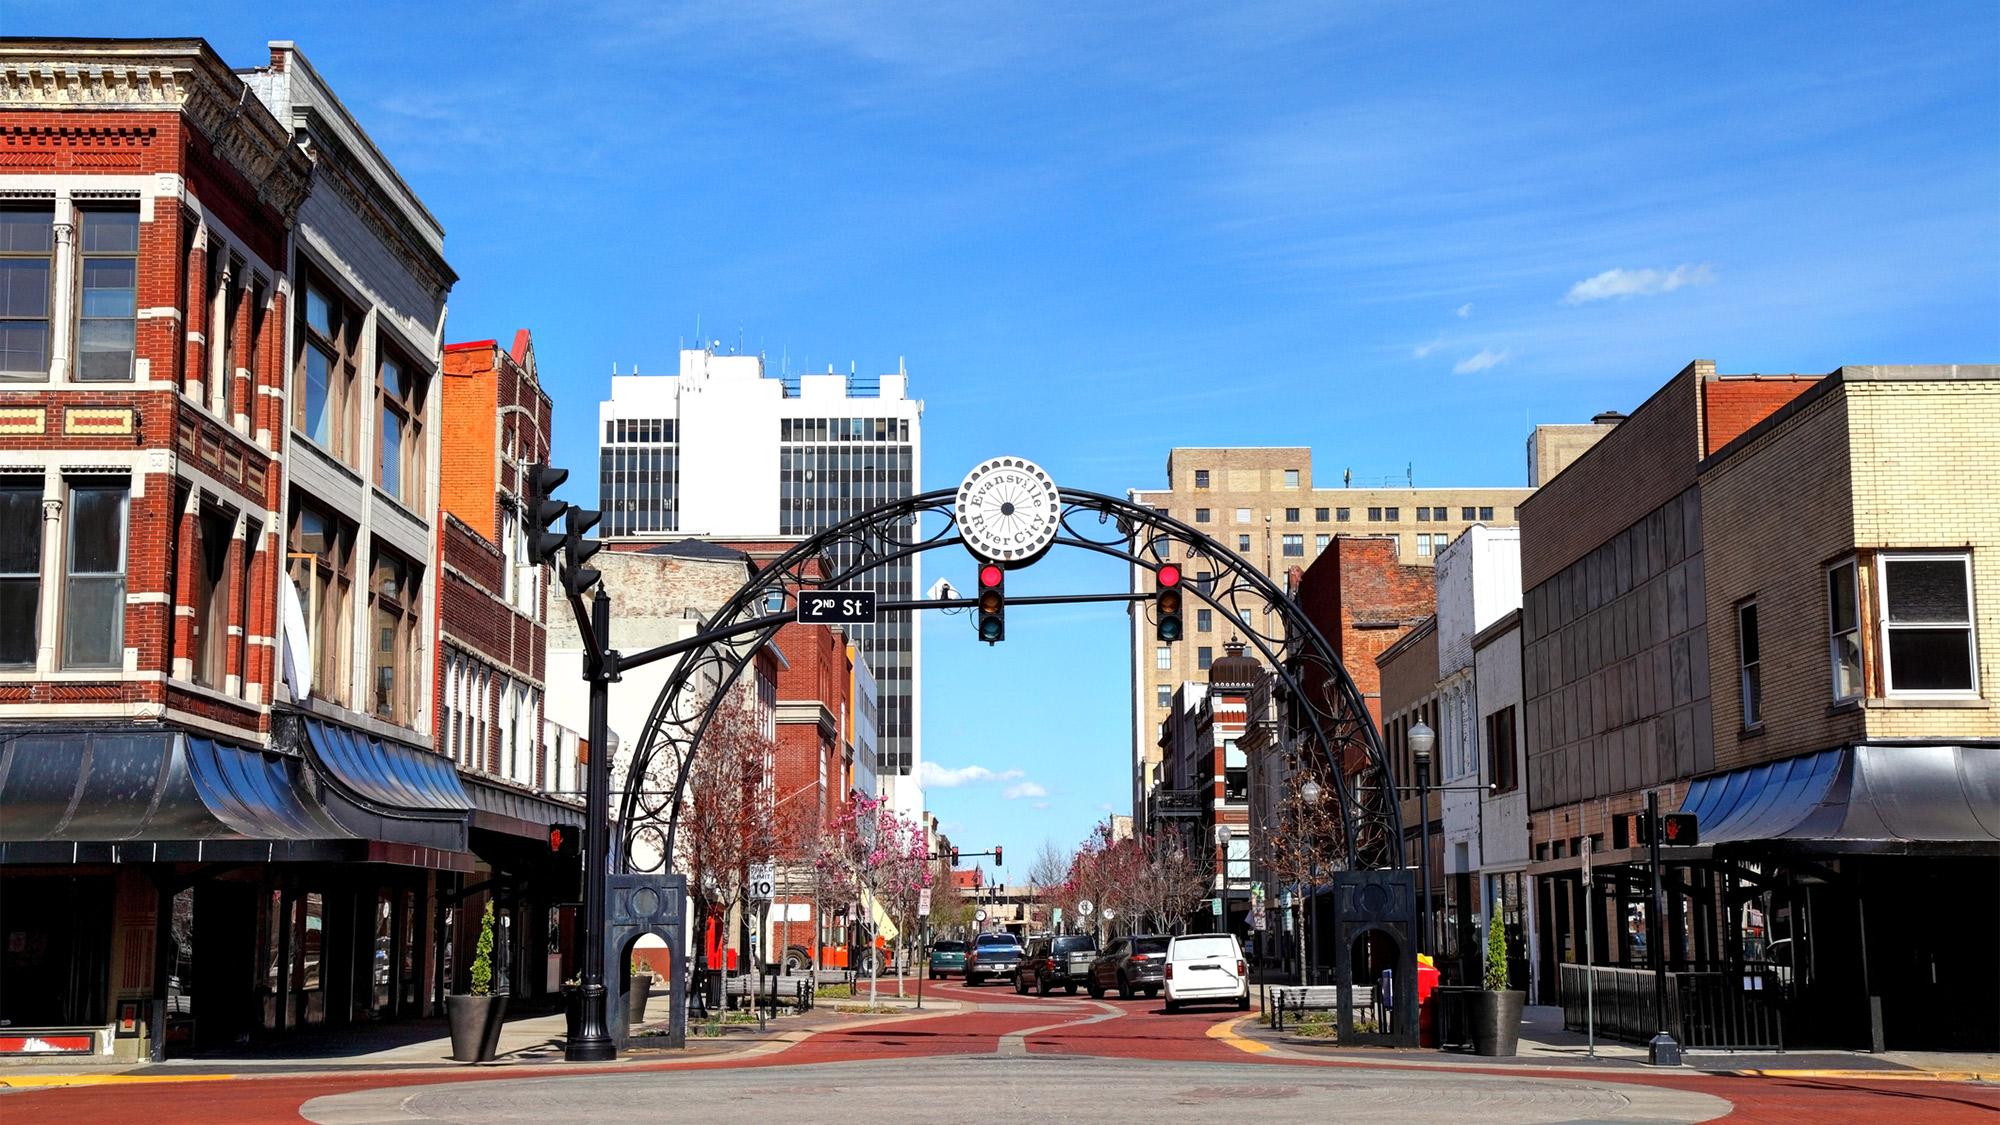 Nơi sống tốt nhất ở Mỹ - Evansville, Indiana